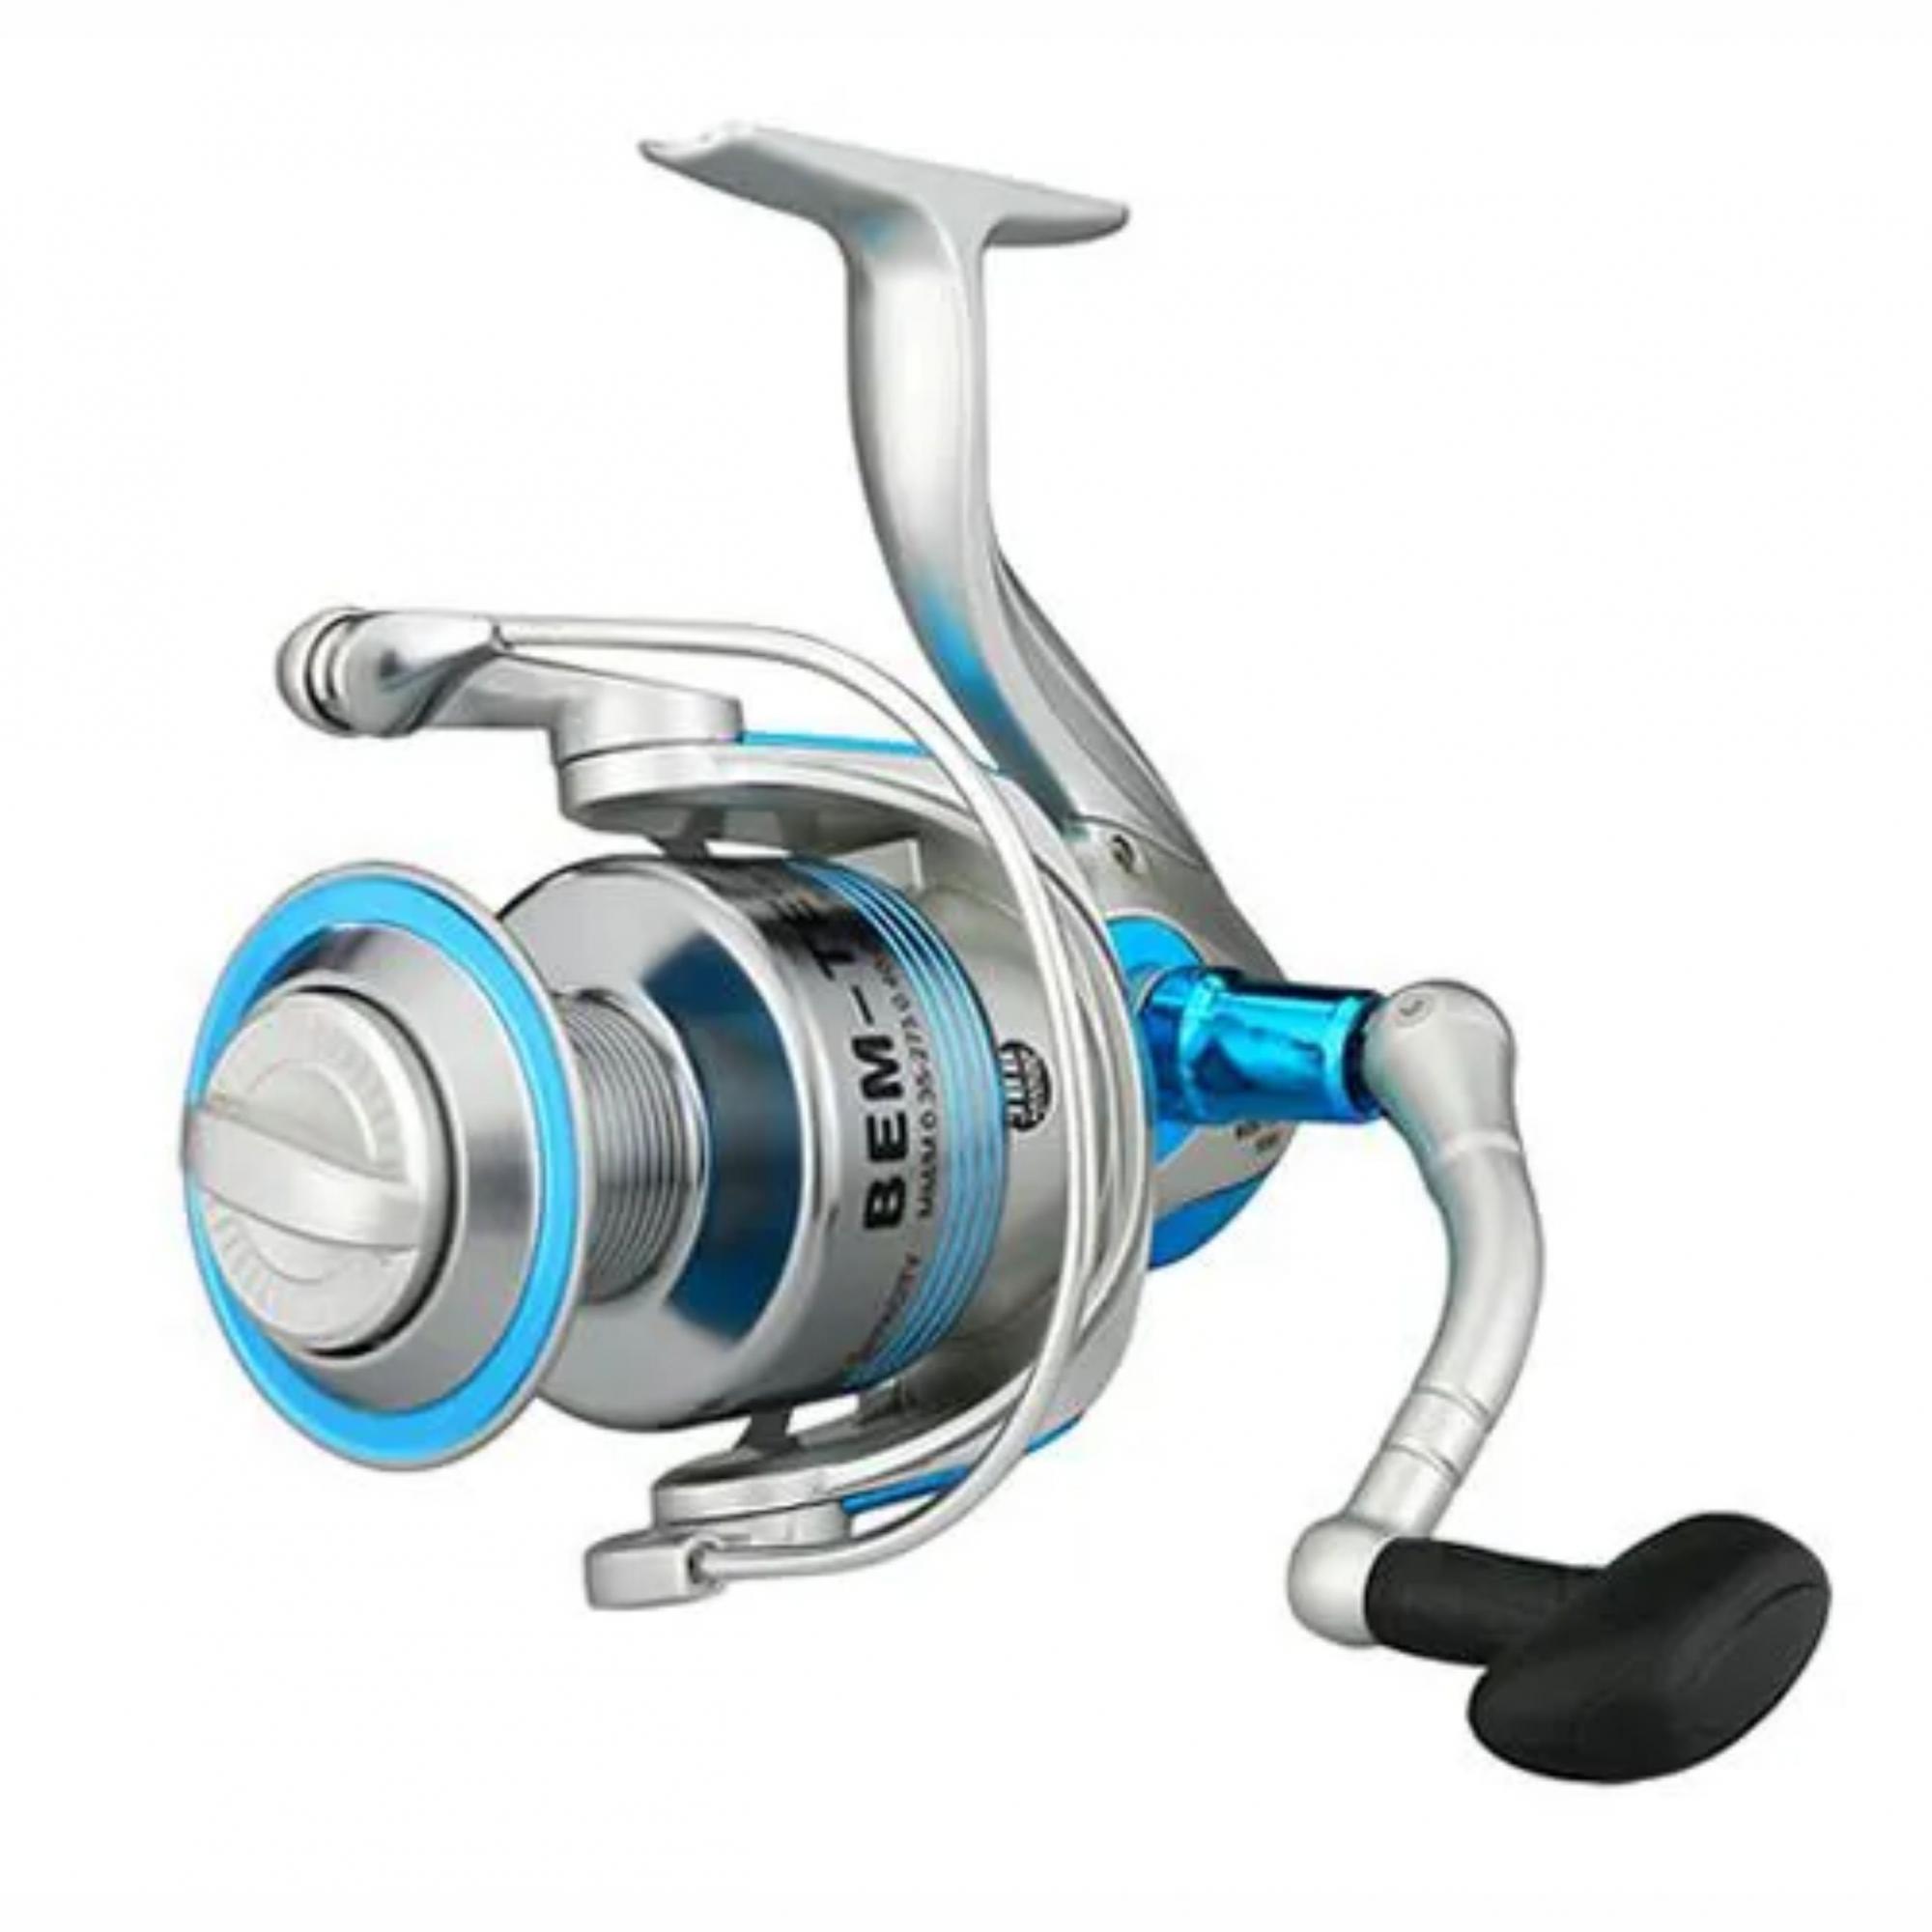 Molinete Albatroz Bem-Te-Vi II 5000  - Pesca Adventure